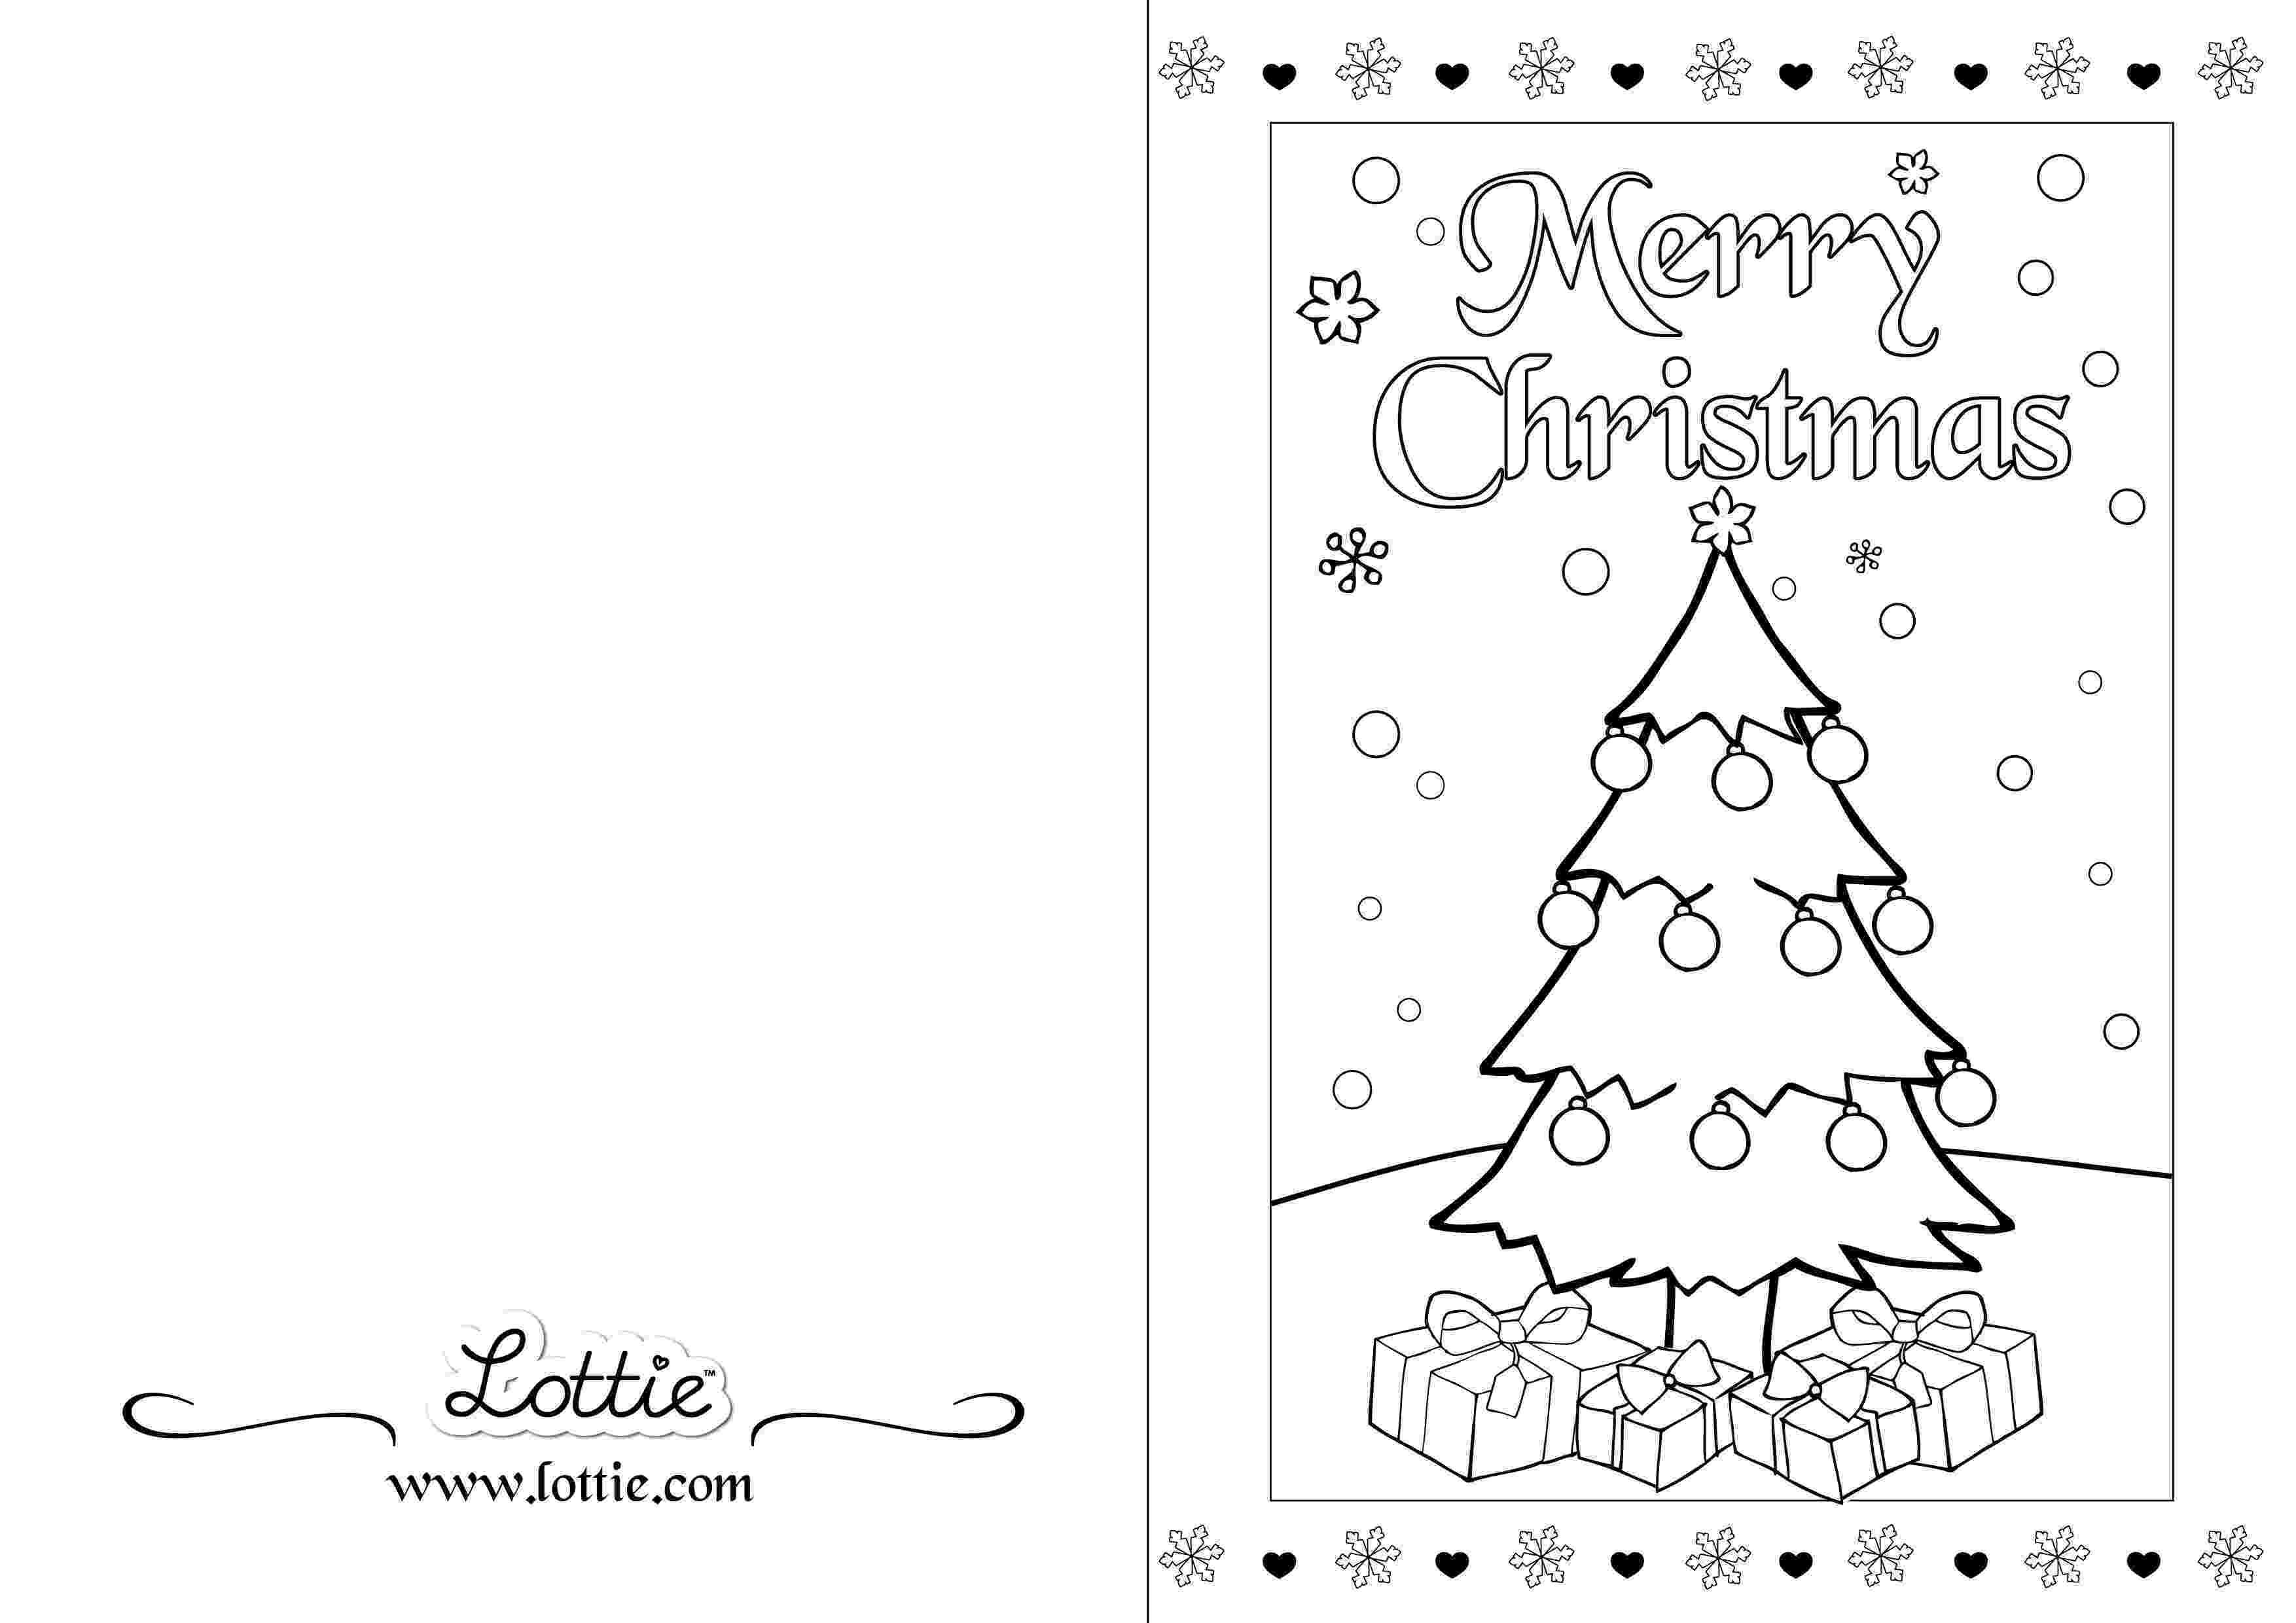 christmas card coloring christmas colouring card 2 lottie irl christmas coloring card